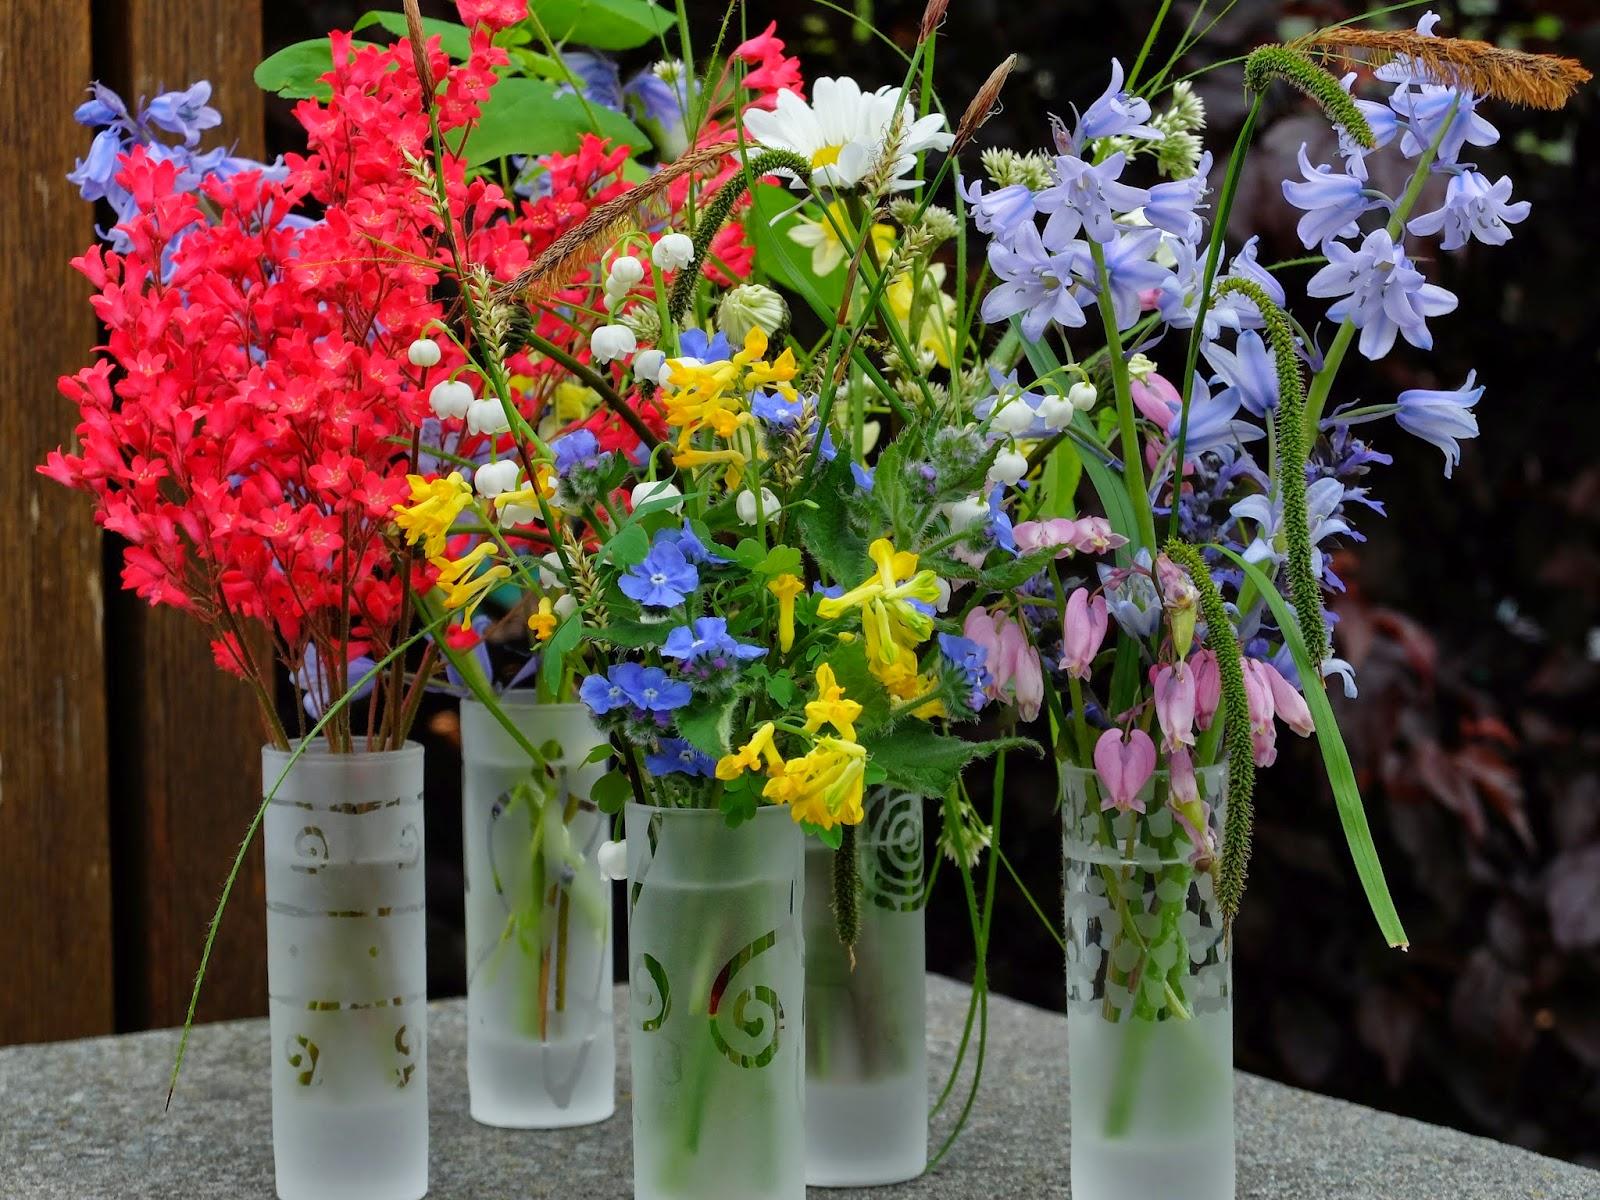 Flower vase pronunciation - Five Small Vases Of Spring Flowers